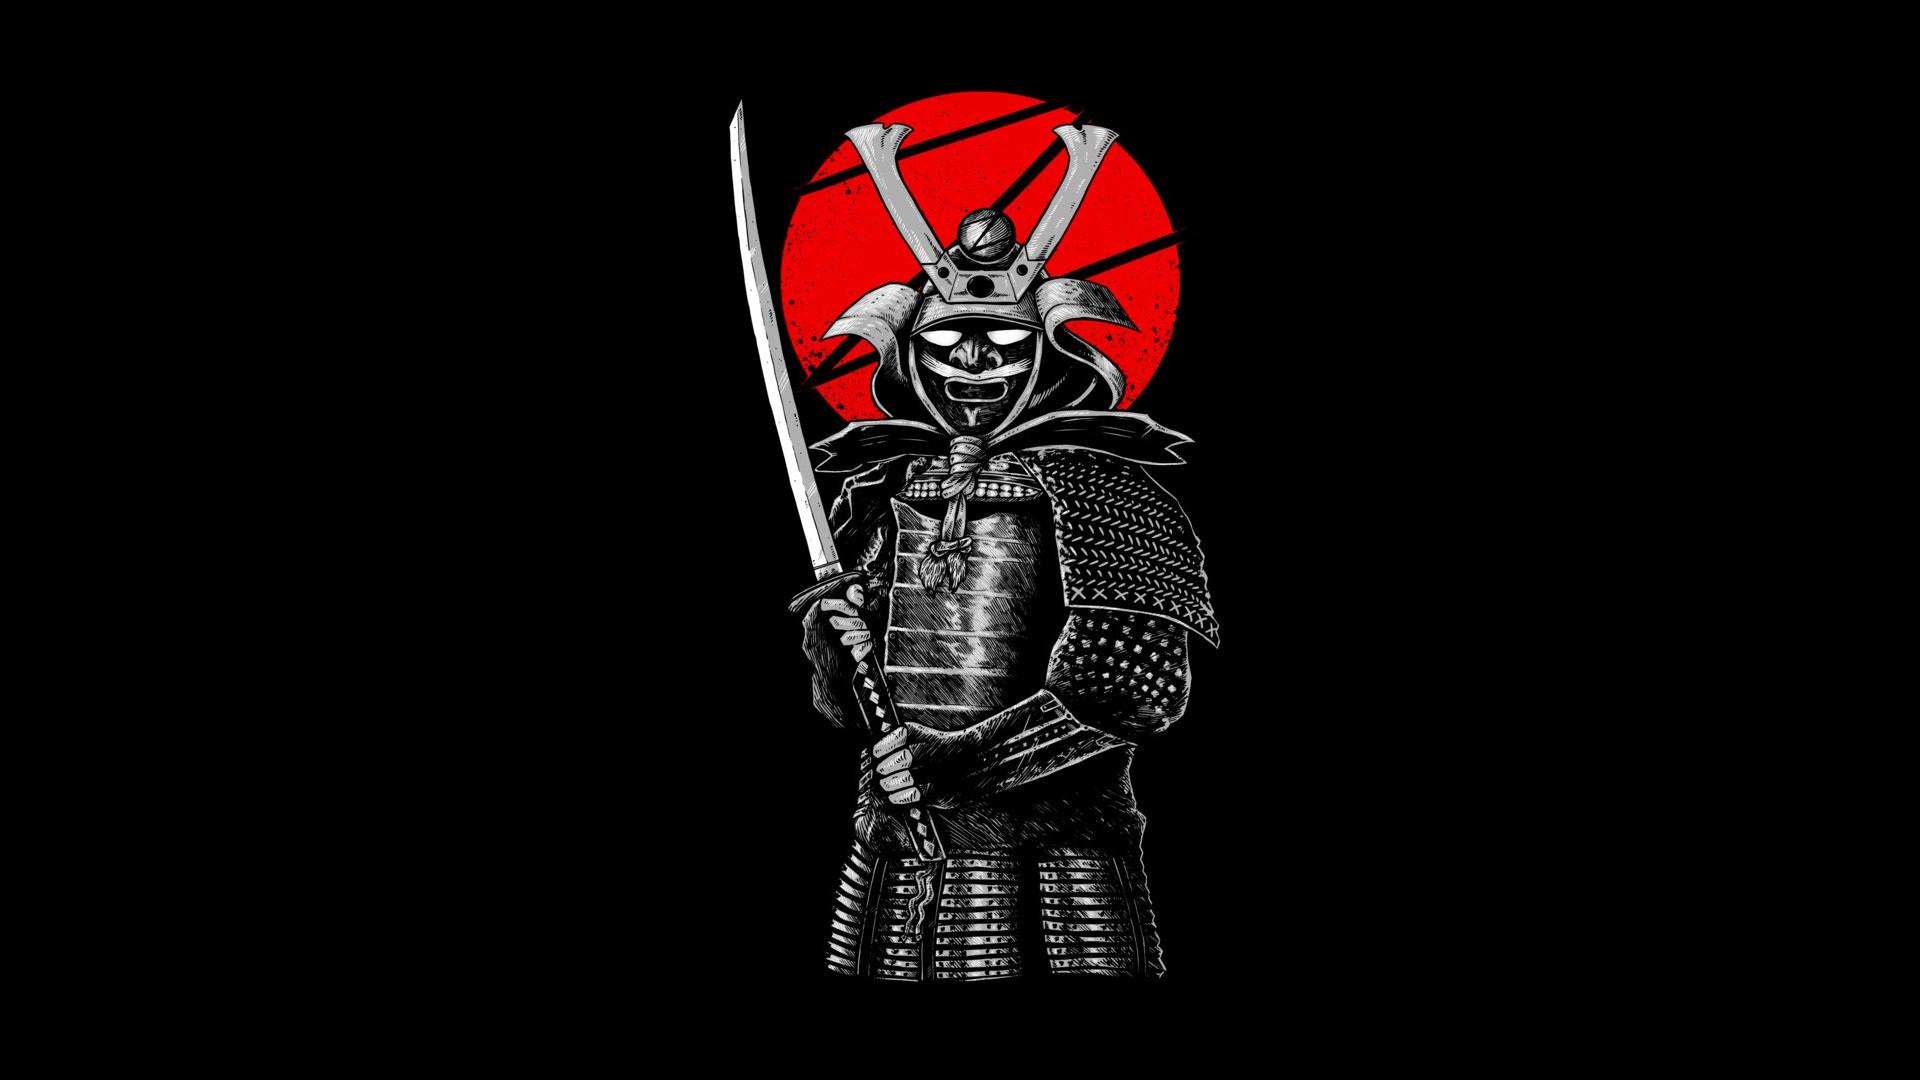 лучшие картинки самураев на телефон